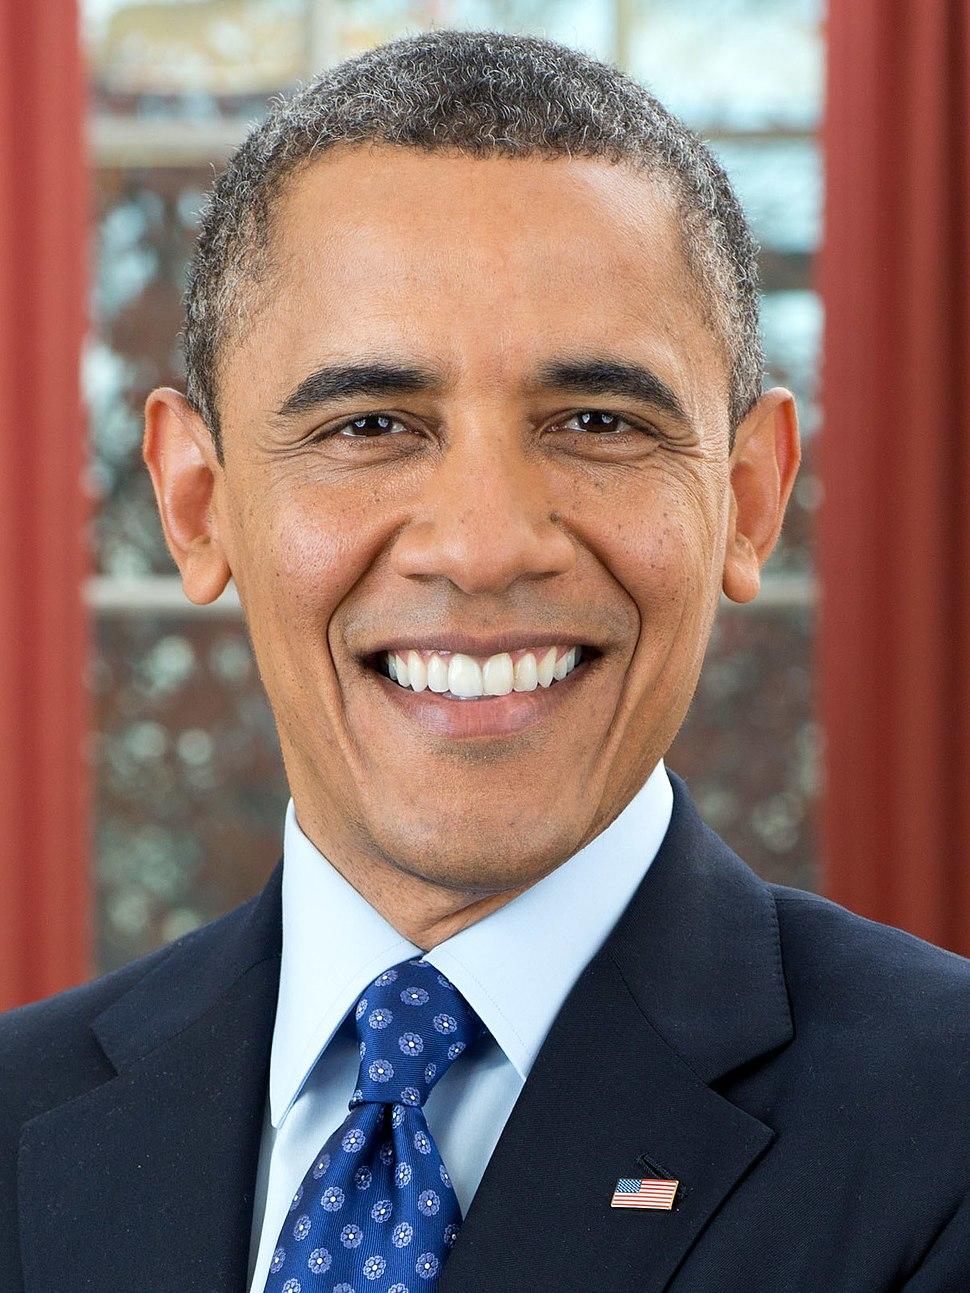 President Barack Obama (cropped)